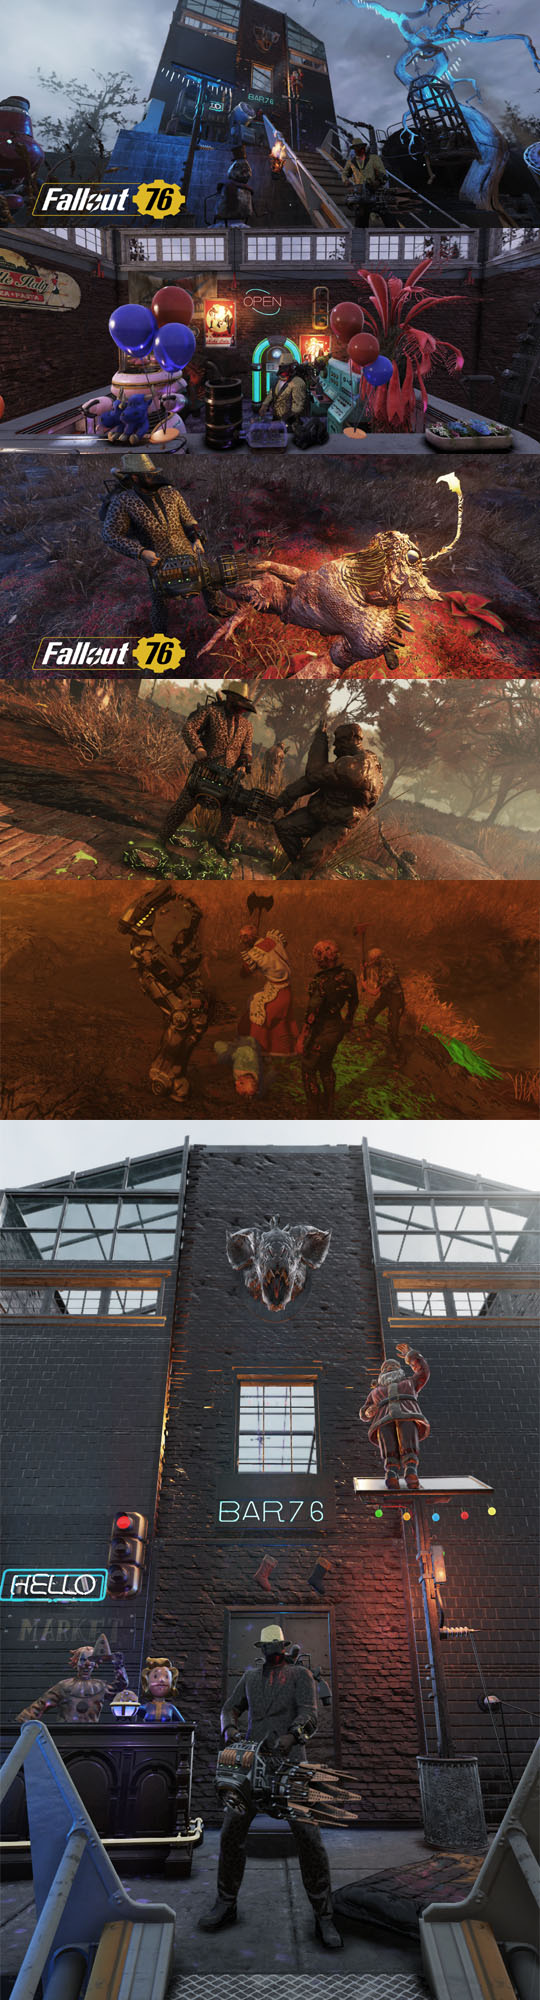 Fallout76 2020_big.jpg